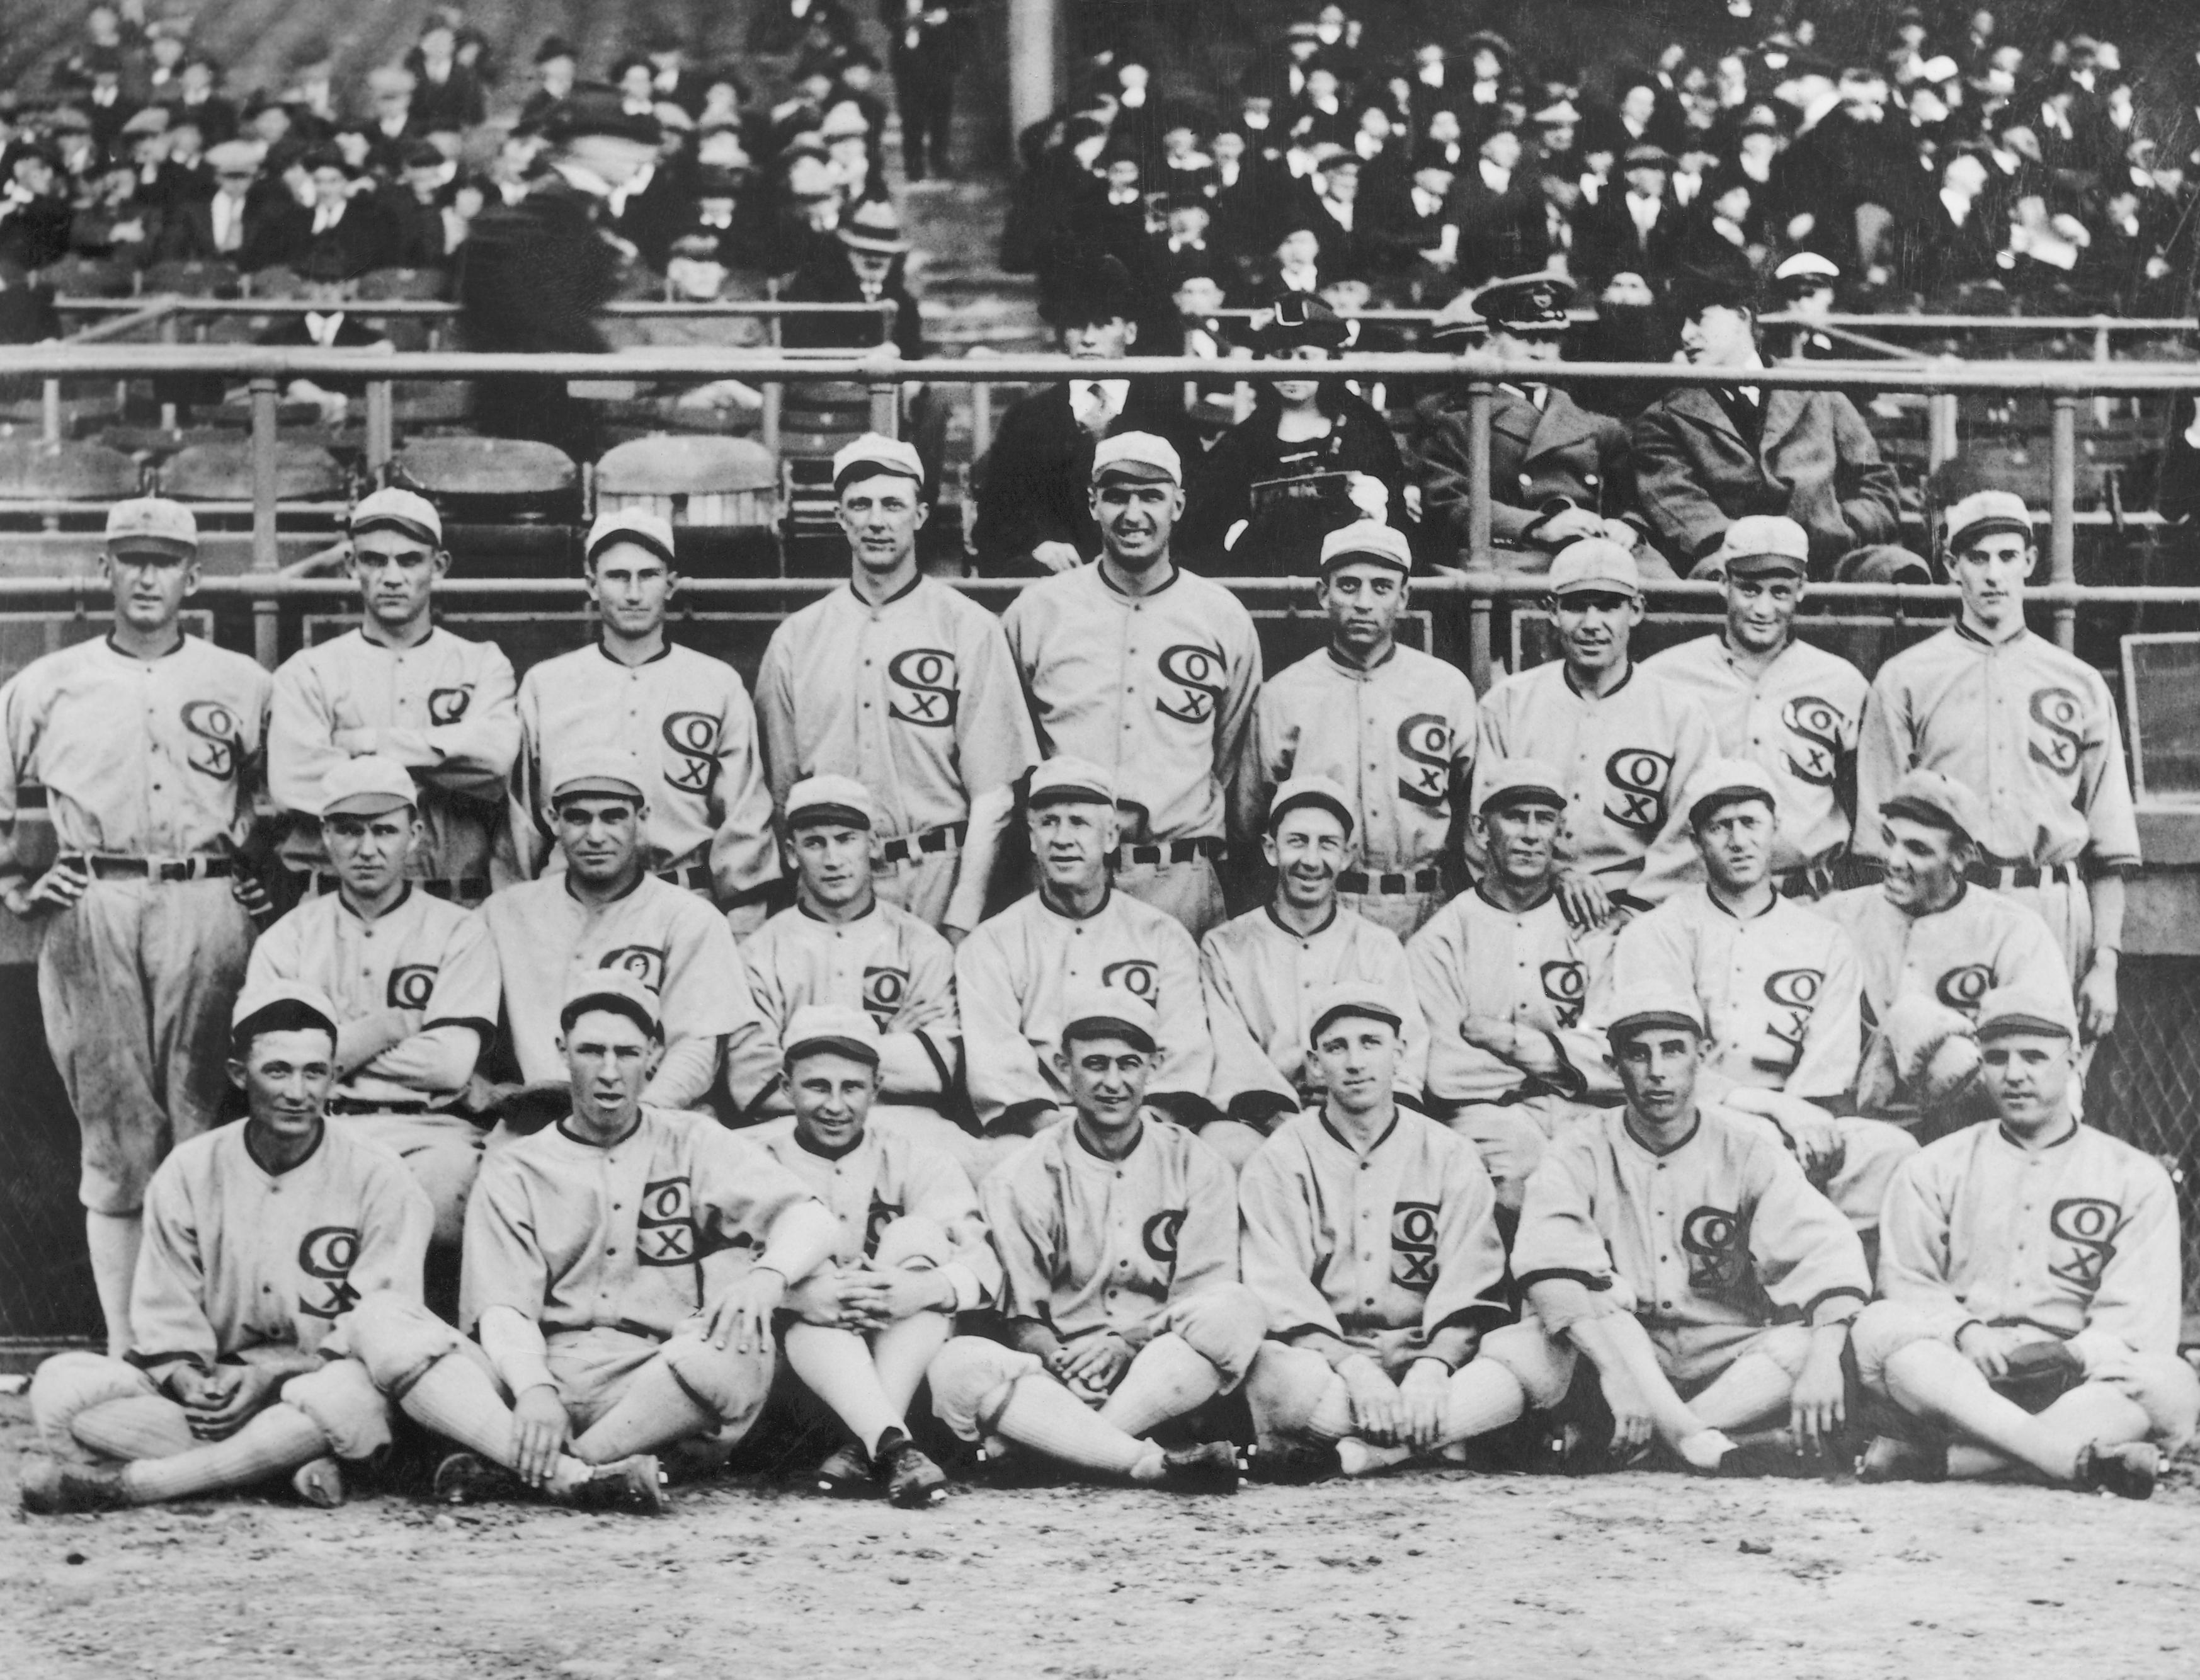 Group Shot of 1919 White Sox